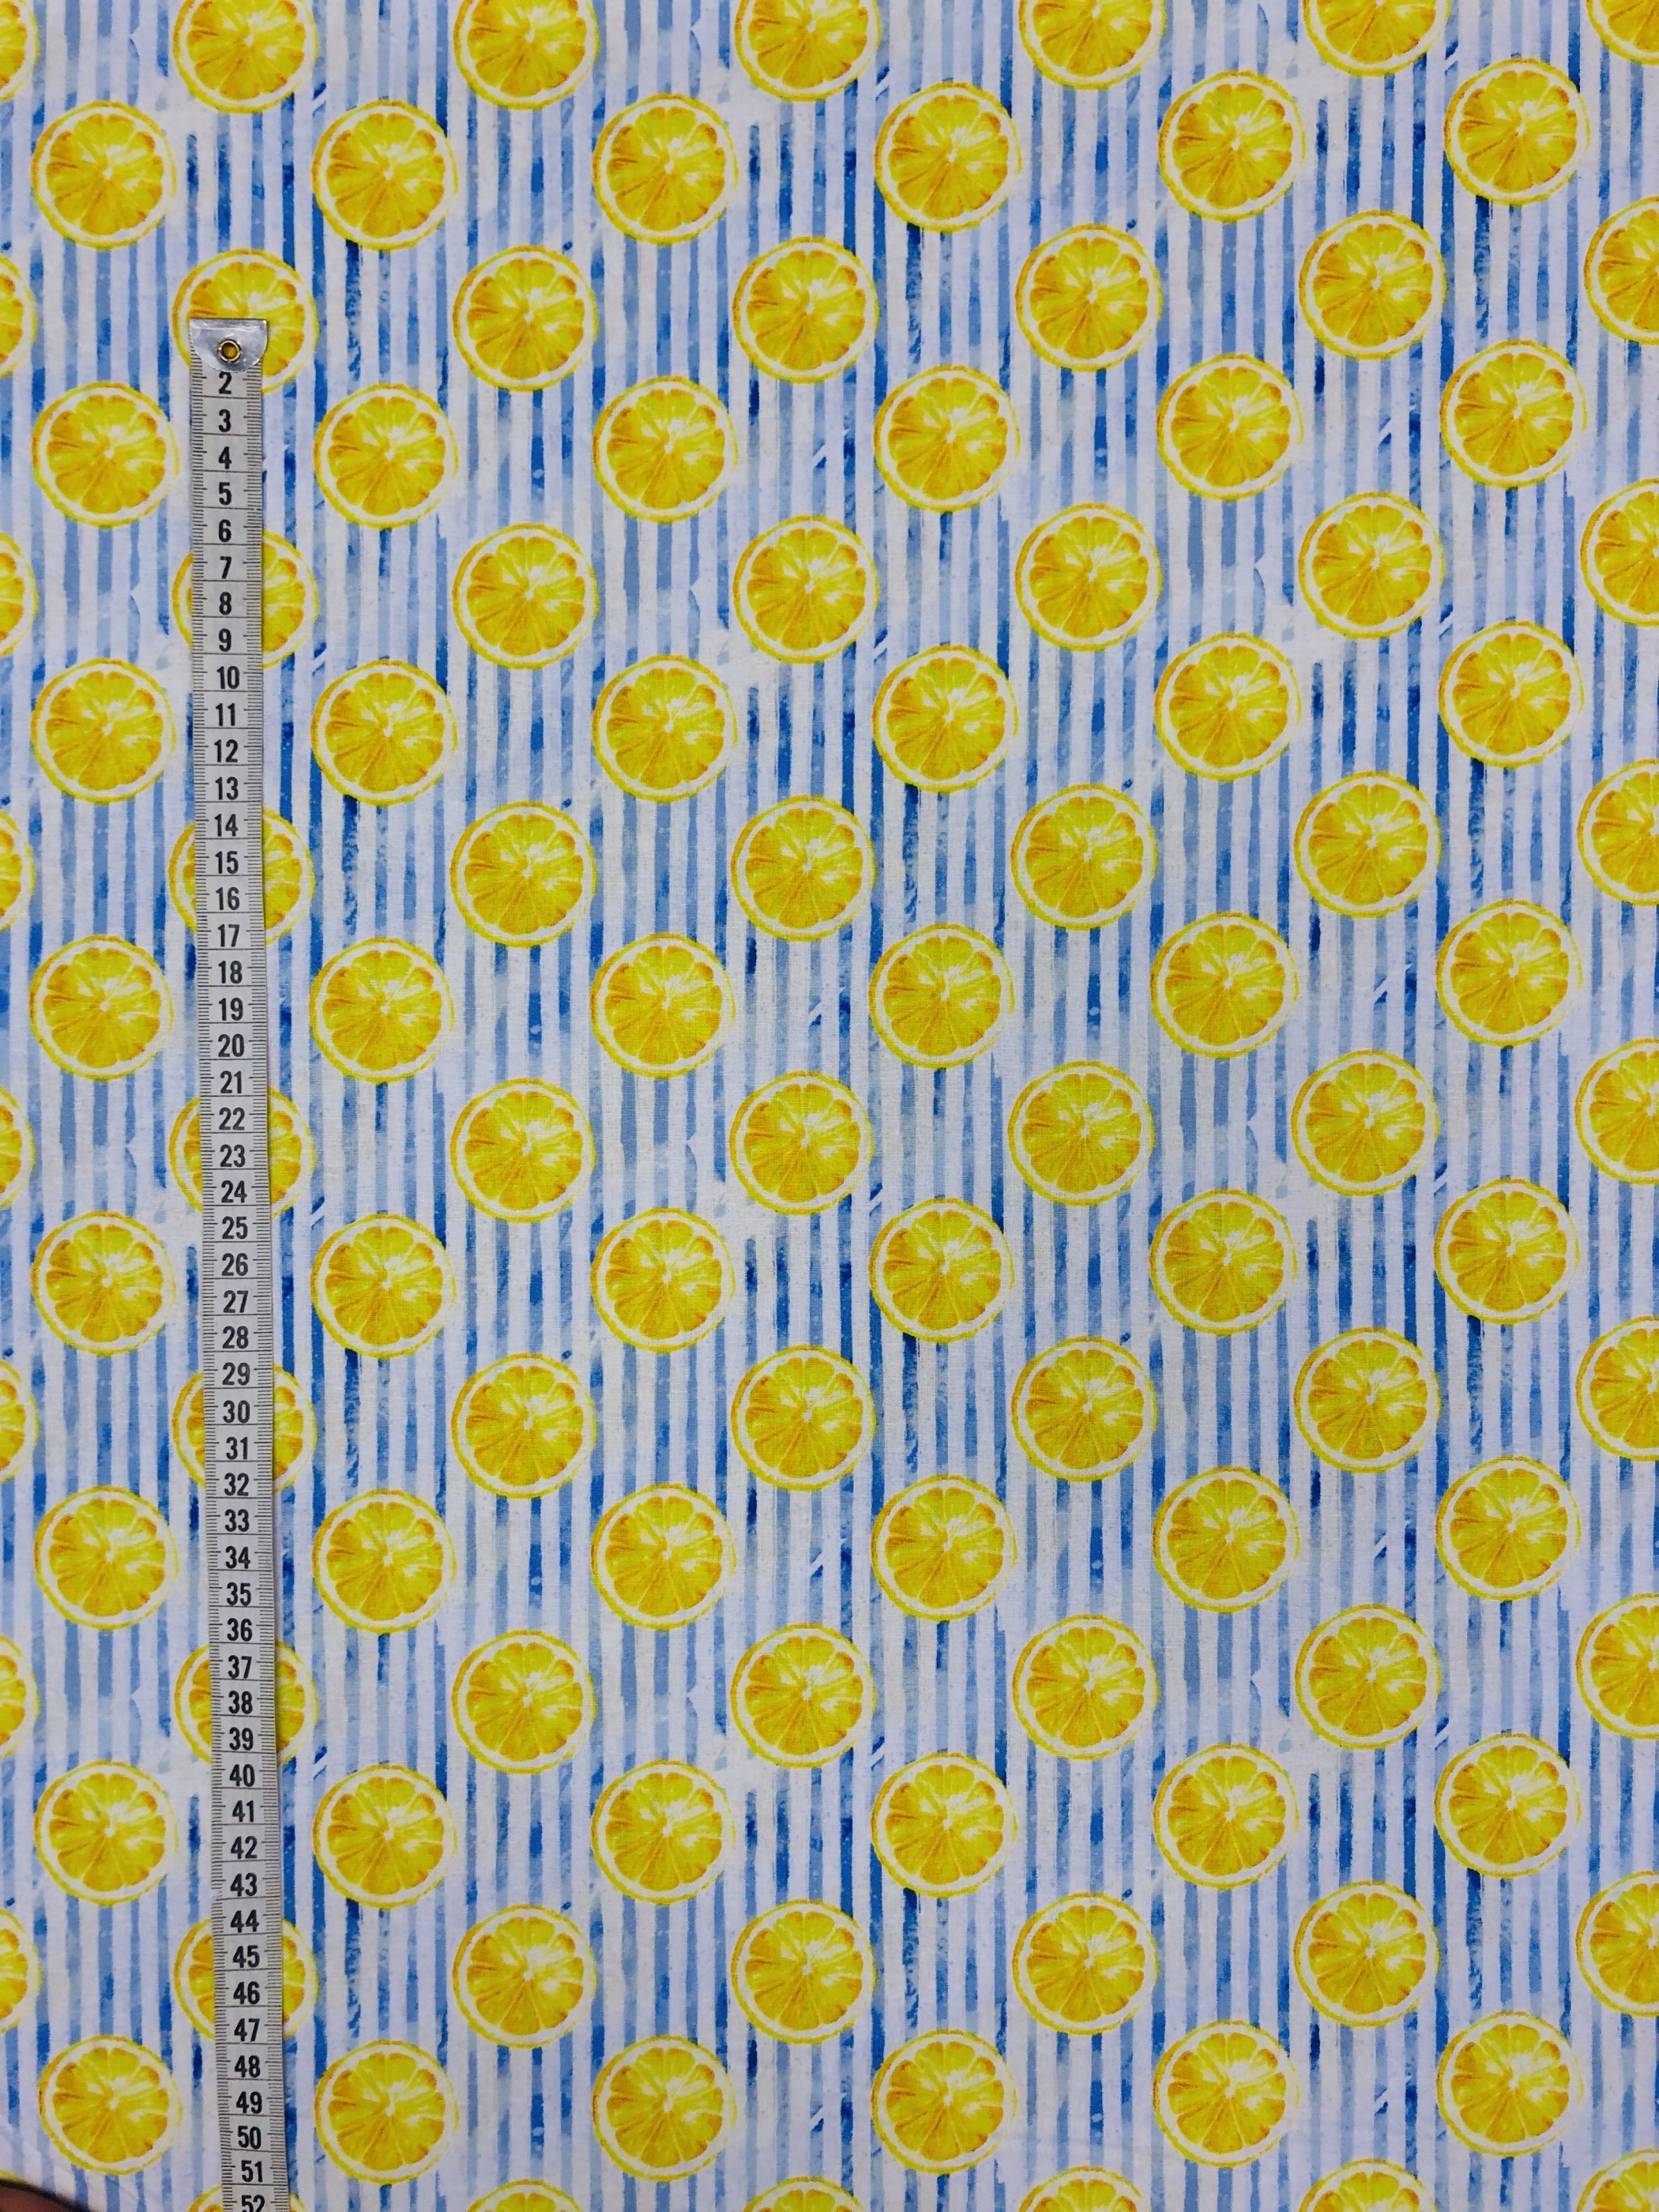 Citroner rand randigt blå vit gul bomullstyg metervara modetyg tyg Tyglust laholm